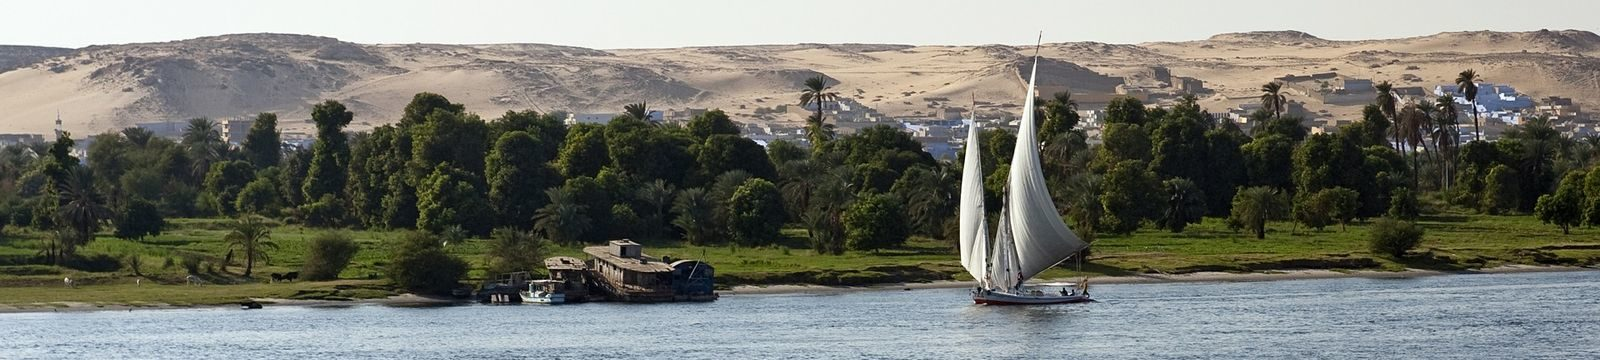 Thutmose I.